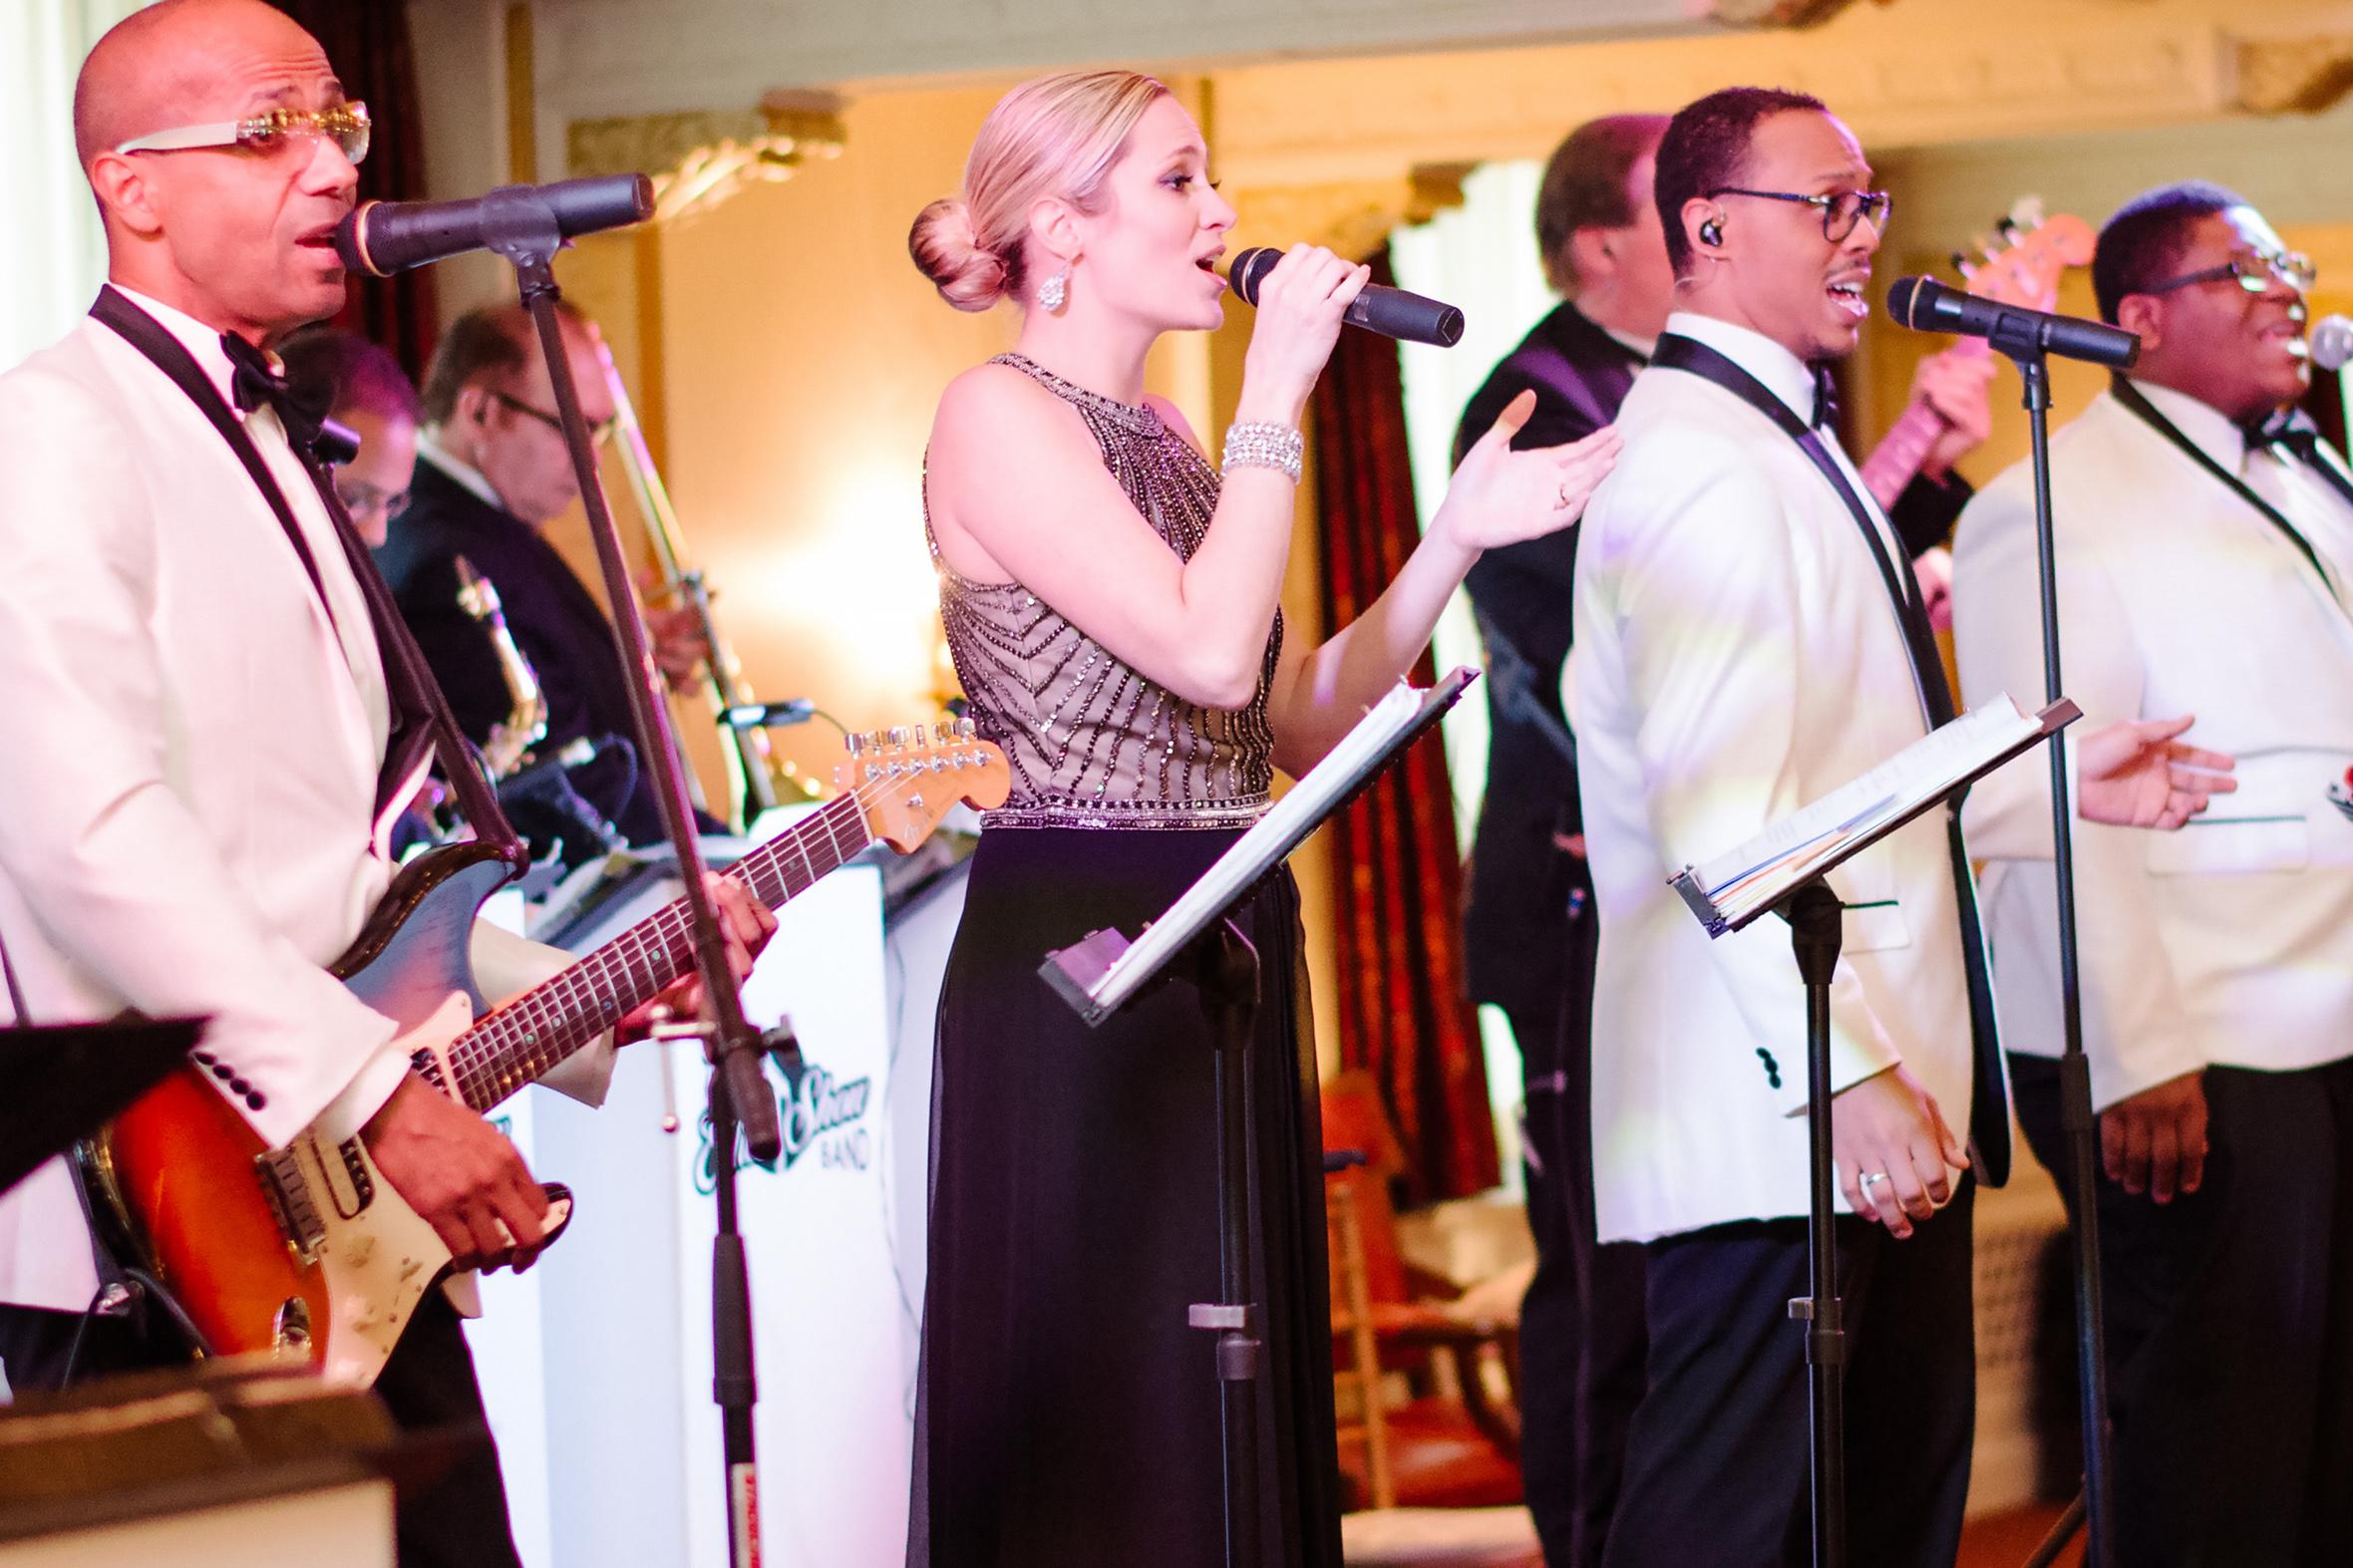 Palm Springs Wedding Band - www.eliteshowband.com